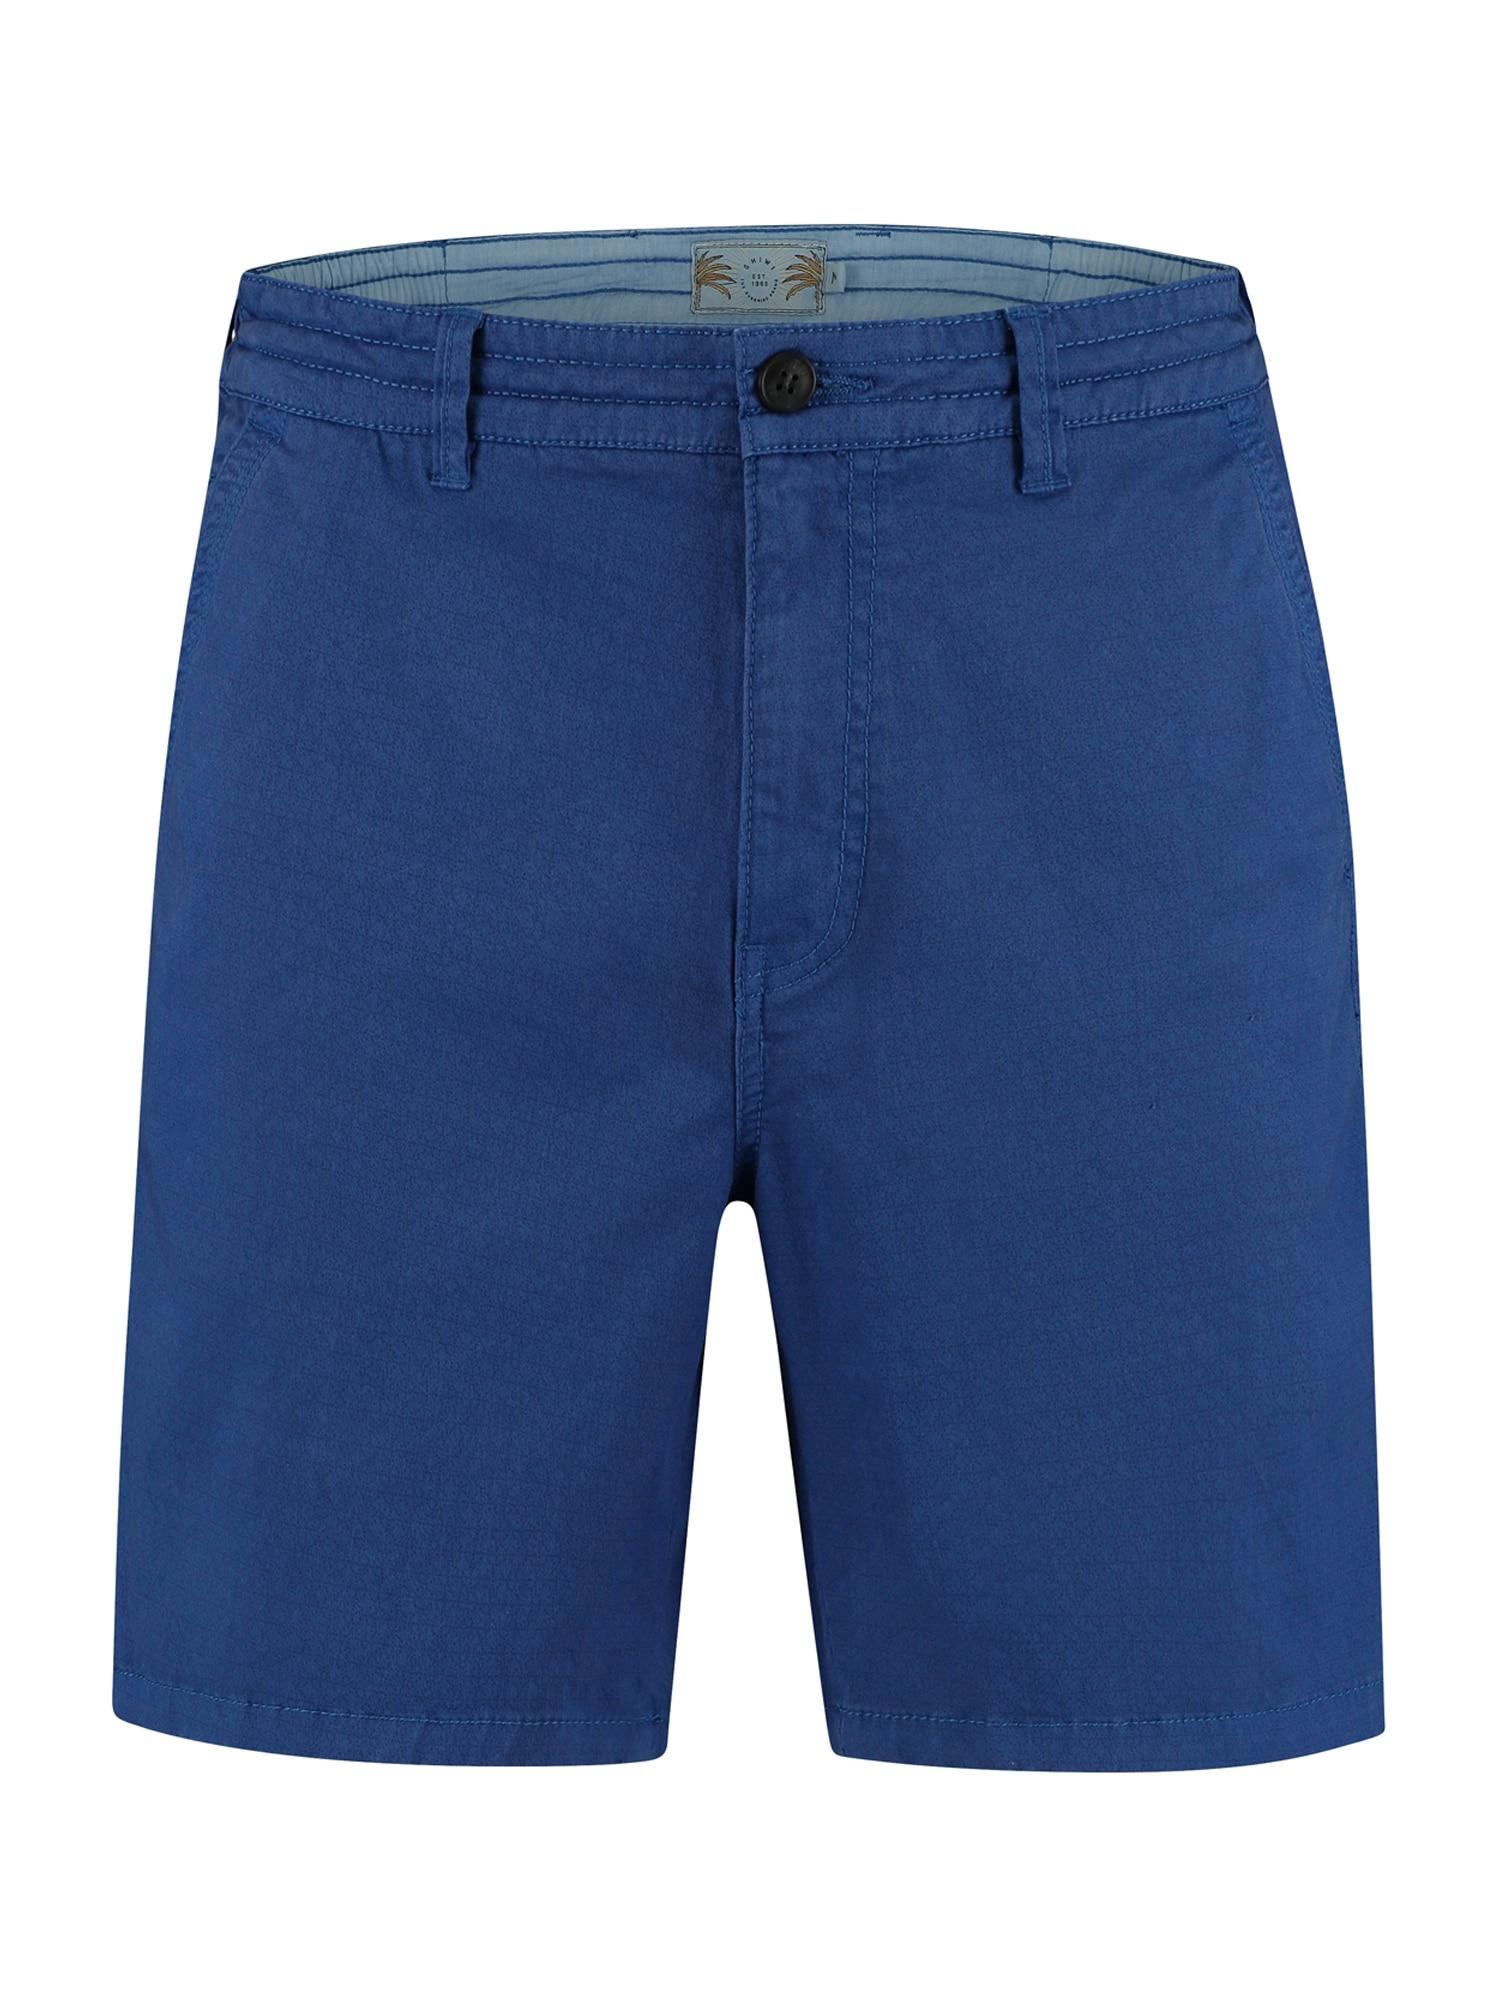 "Shiwi ""Chino"" stiliaus kelnės 'Jack' mėlyna"